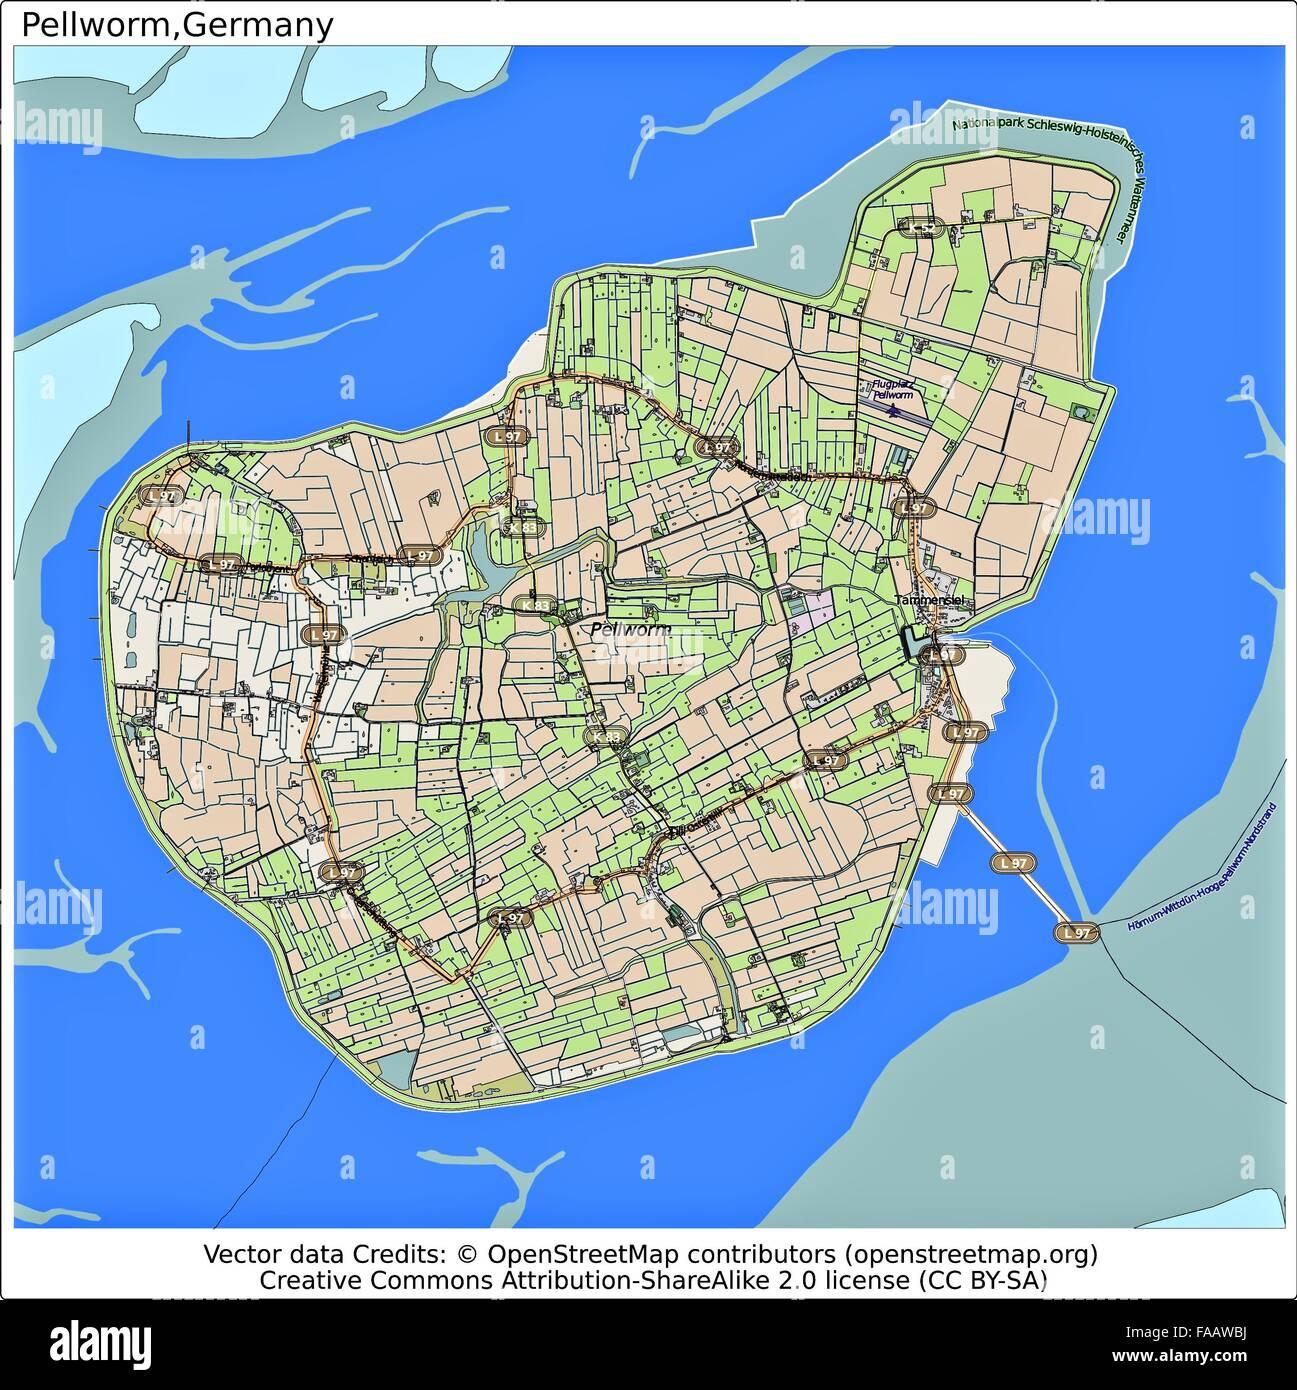 Pellworm Karte.Pellworm Deutschland Insel Stadtplan Stockfoto Bild